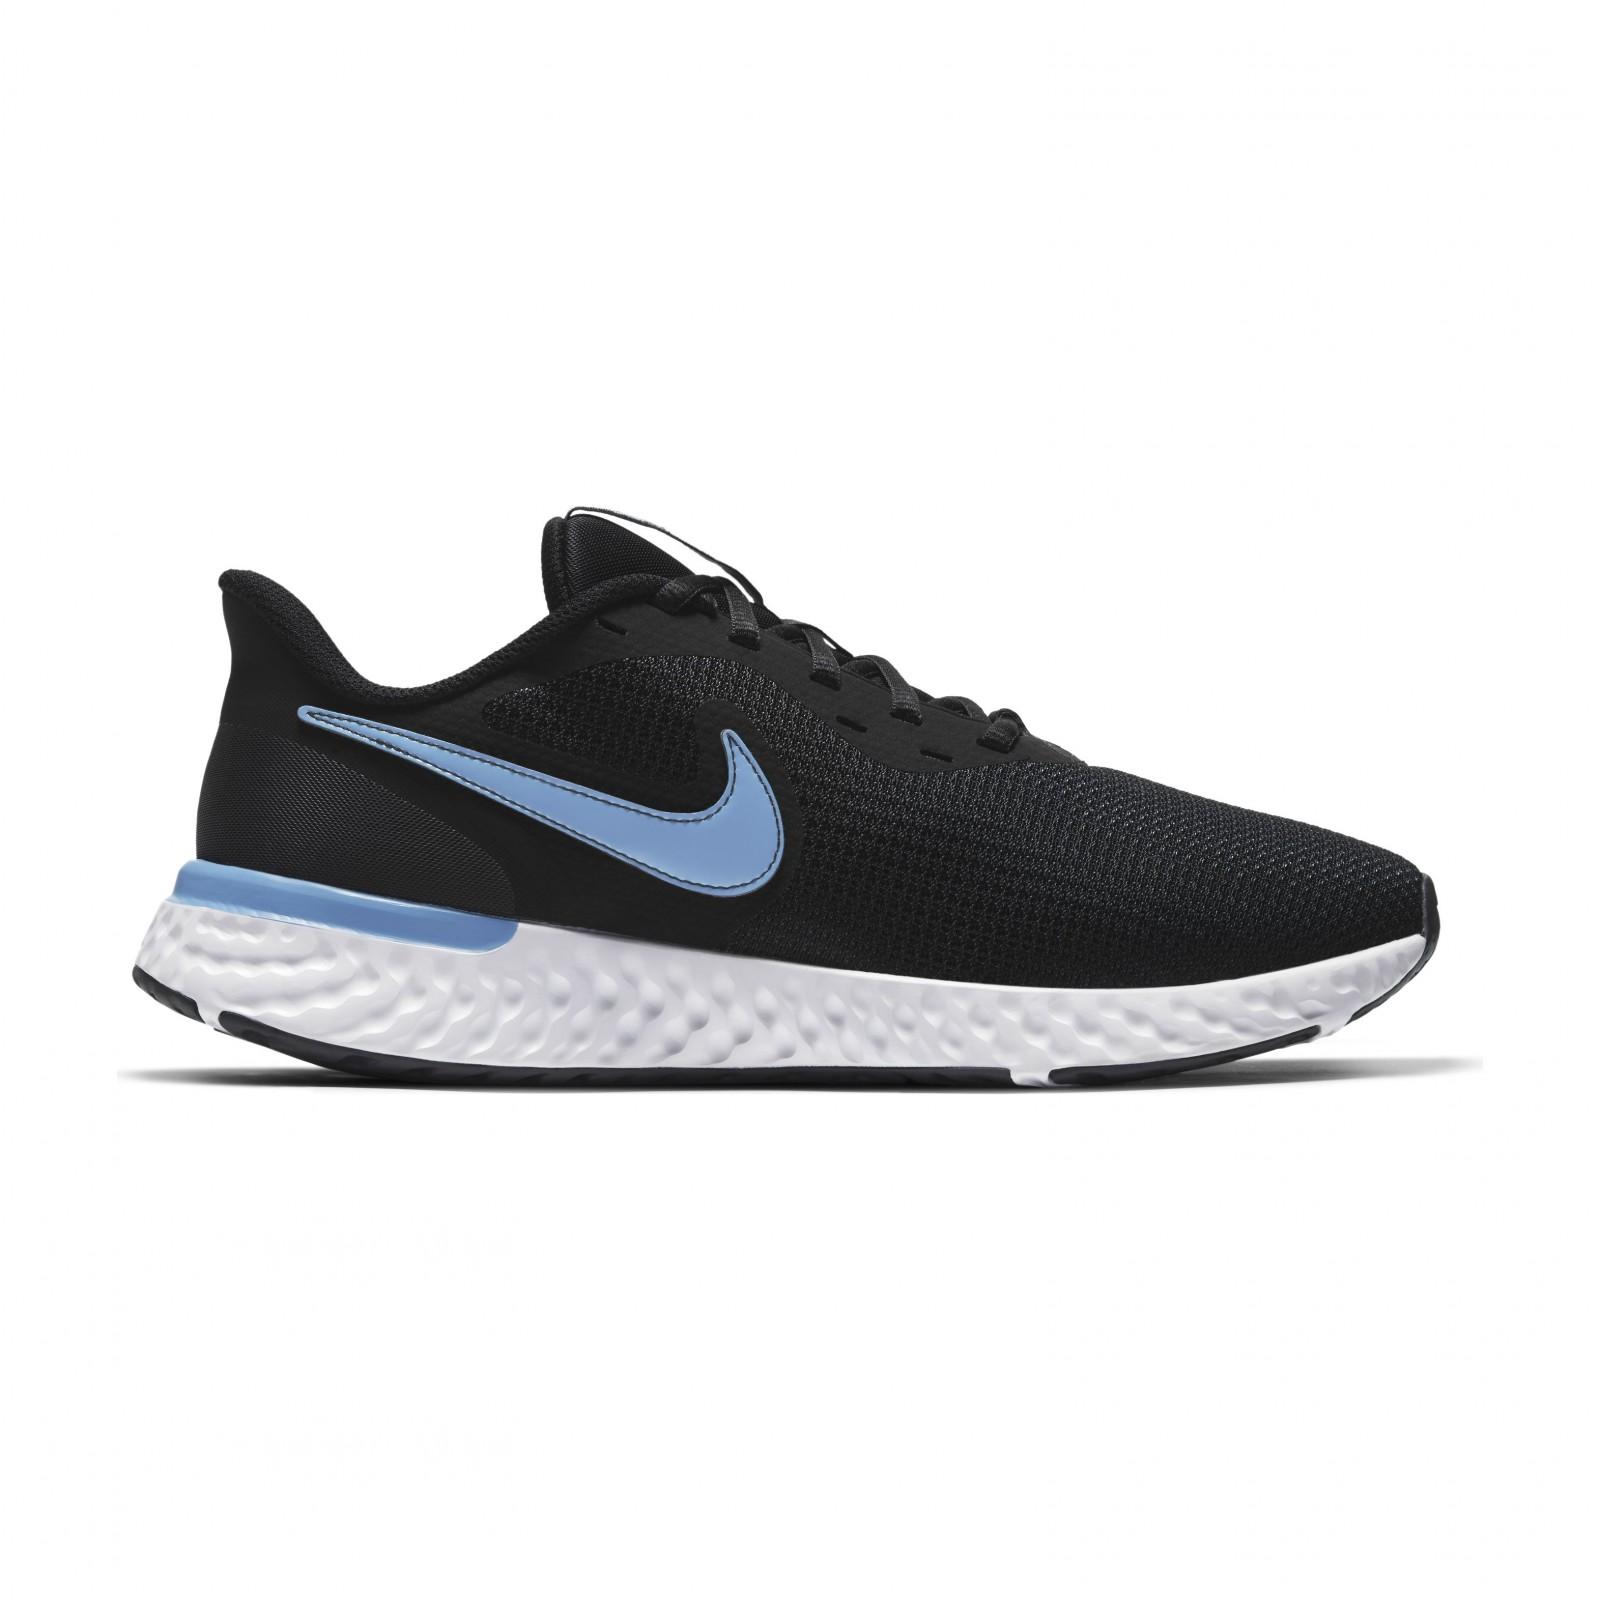 Nike Revolution 5 EXT BLACK/COAST-DK SMOKE GREY-WHITE